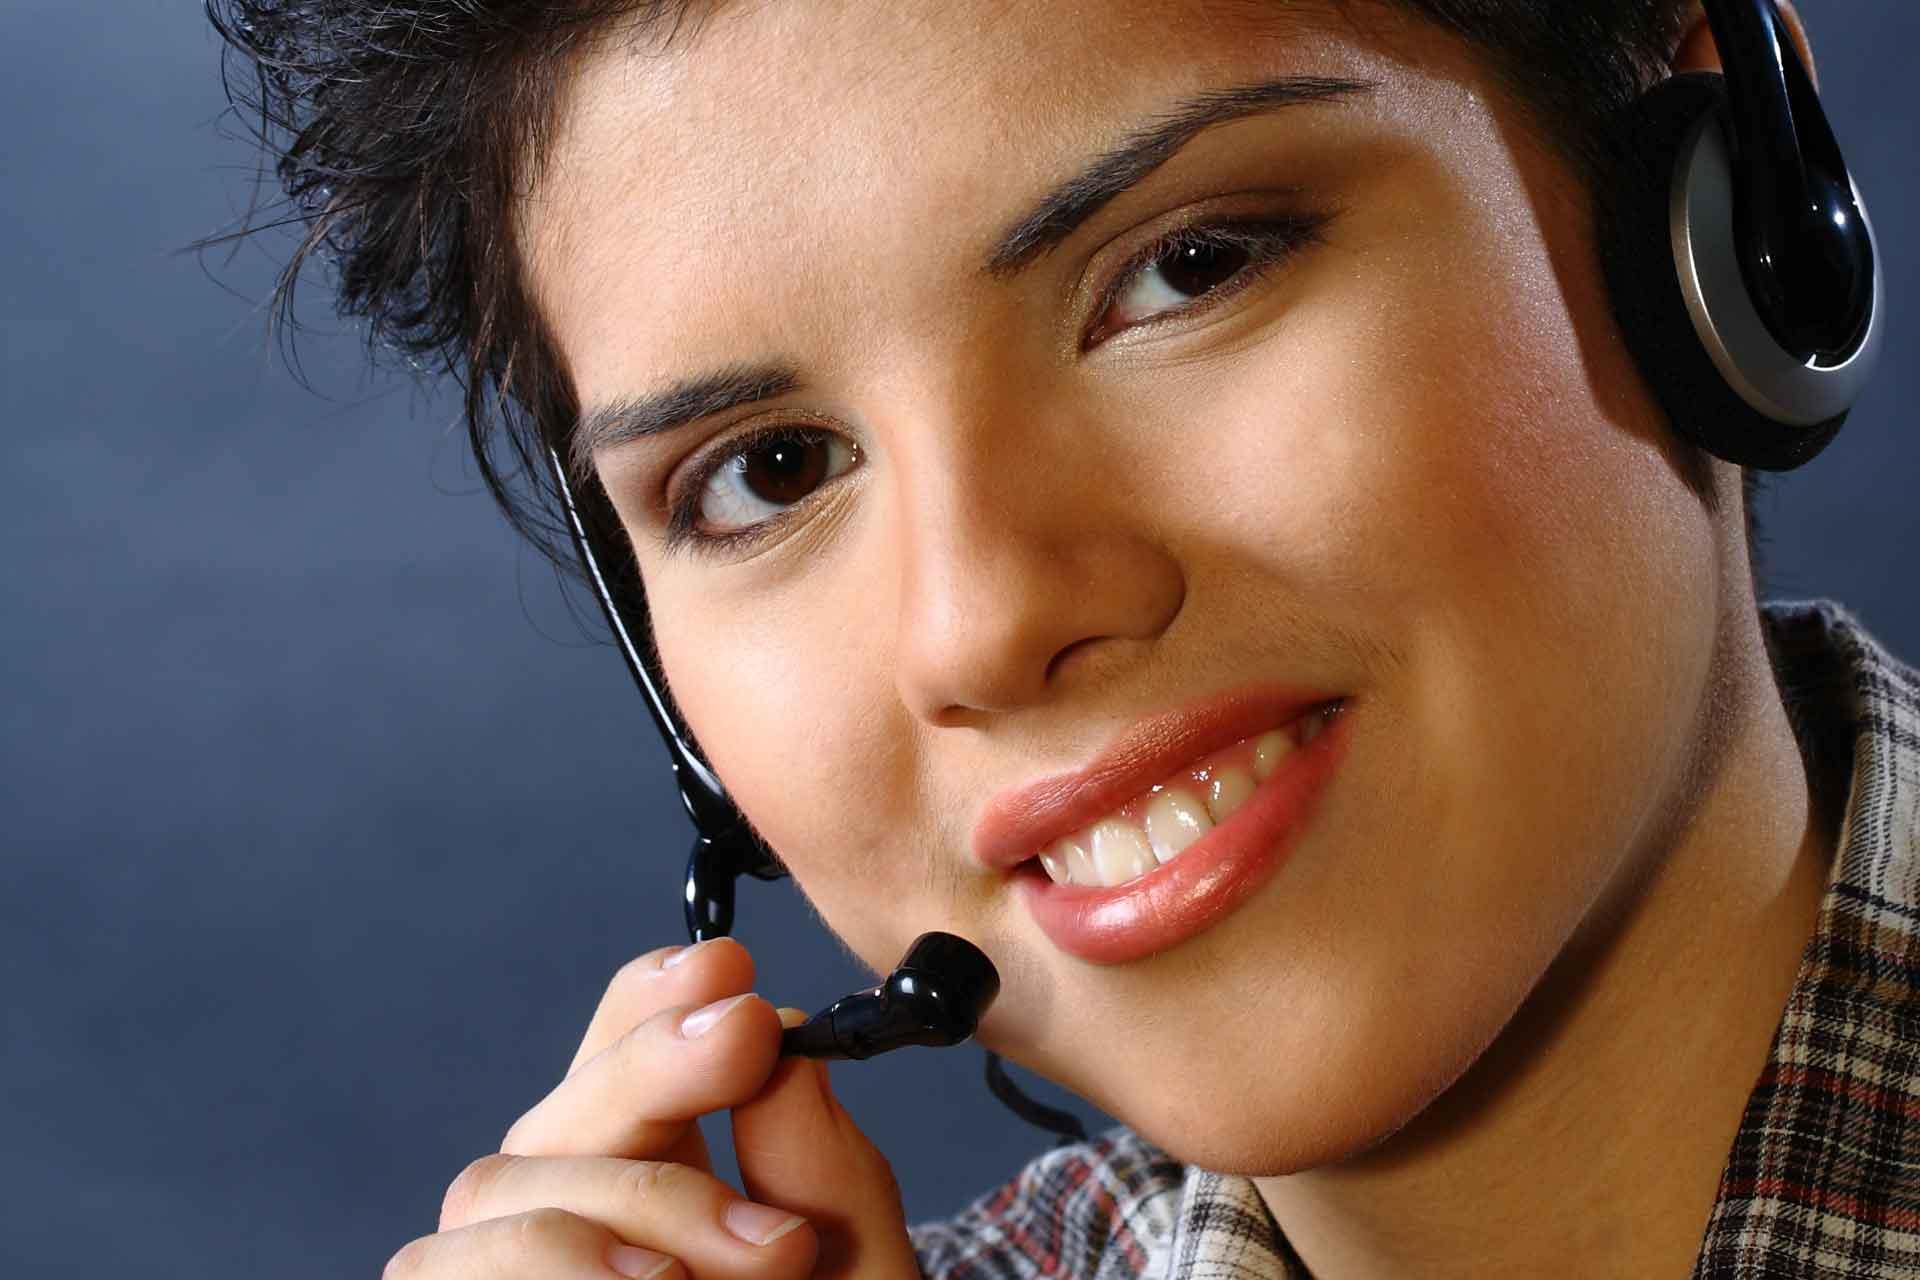 Teen Link Phone Worker